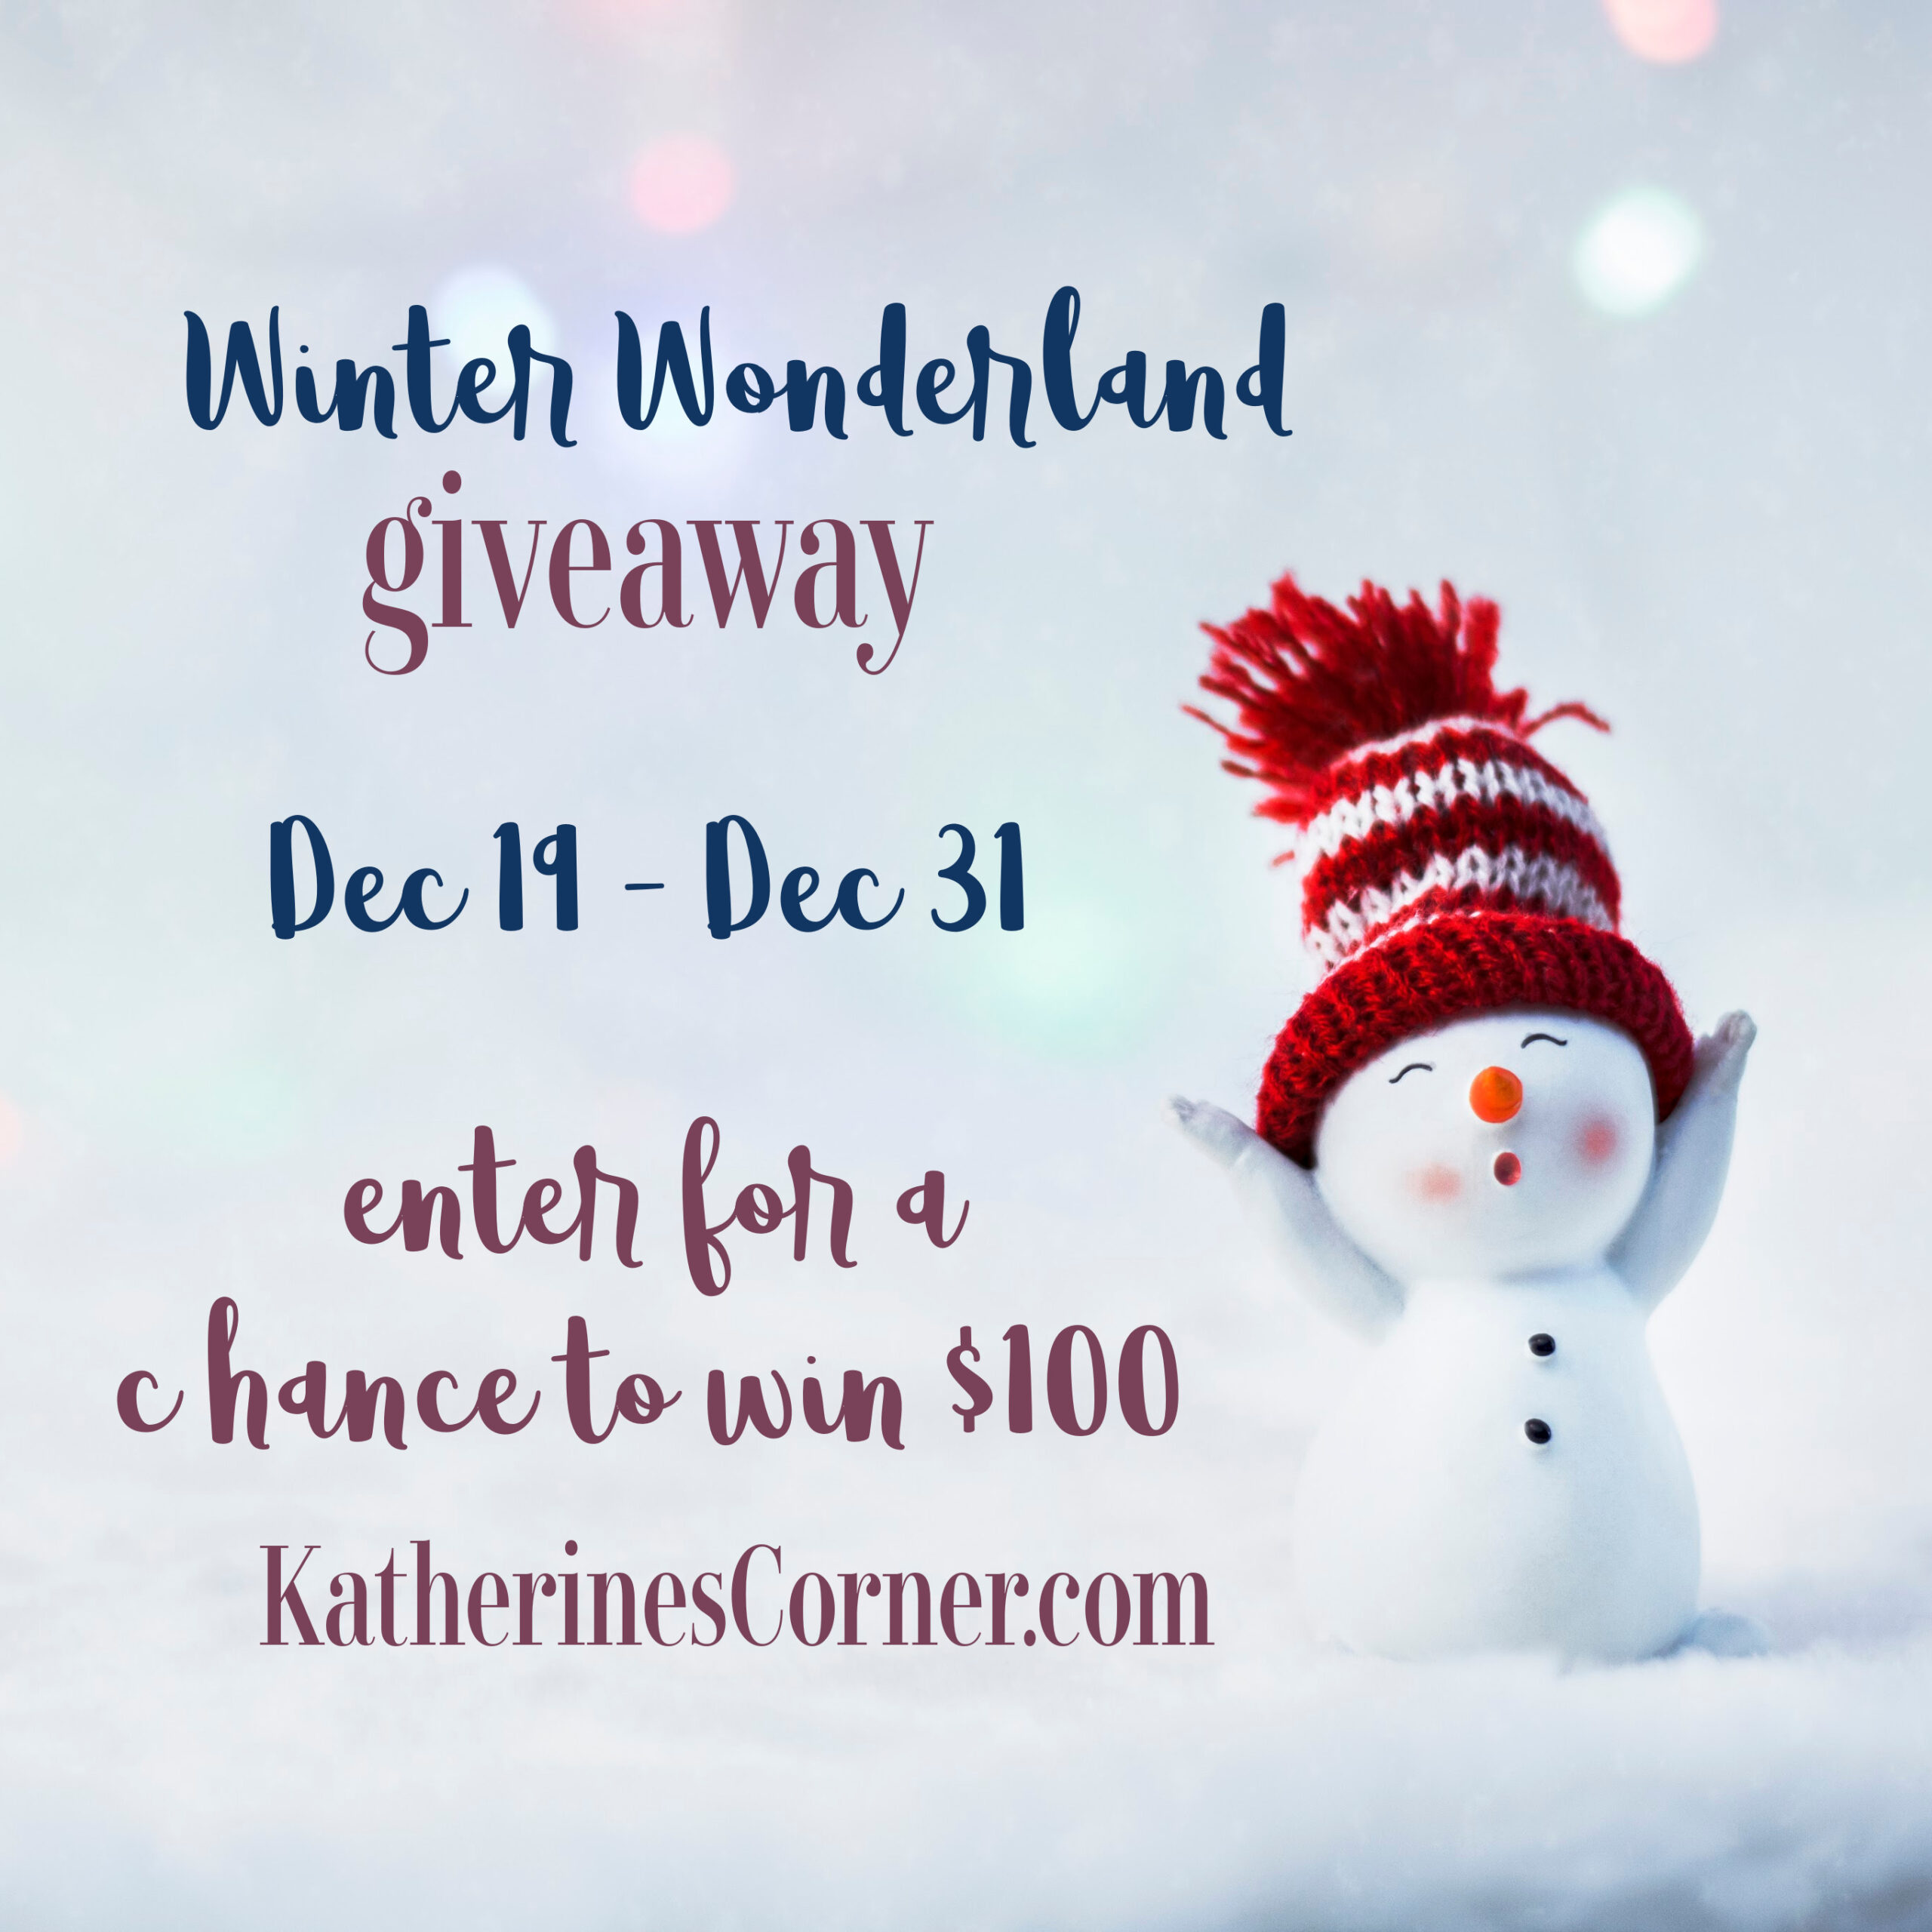 Winter Wonderland Giveaway